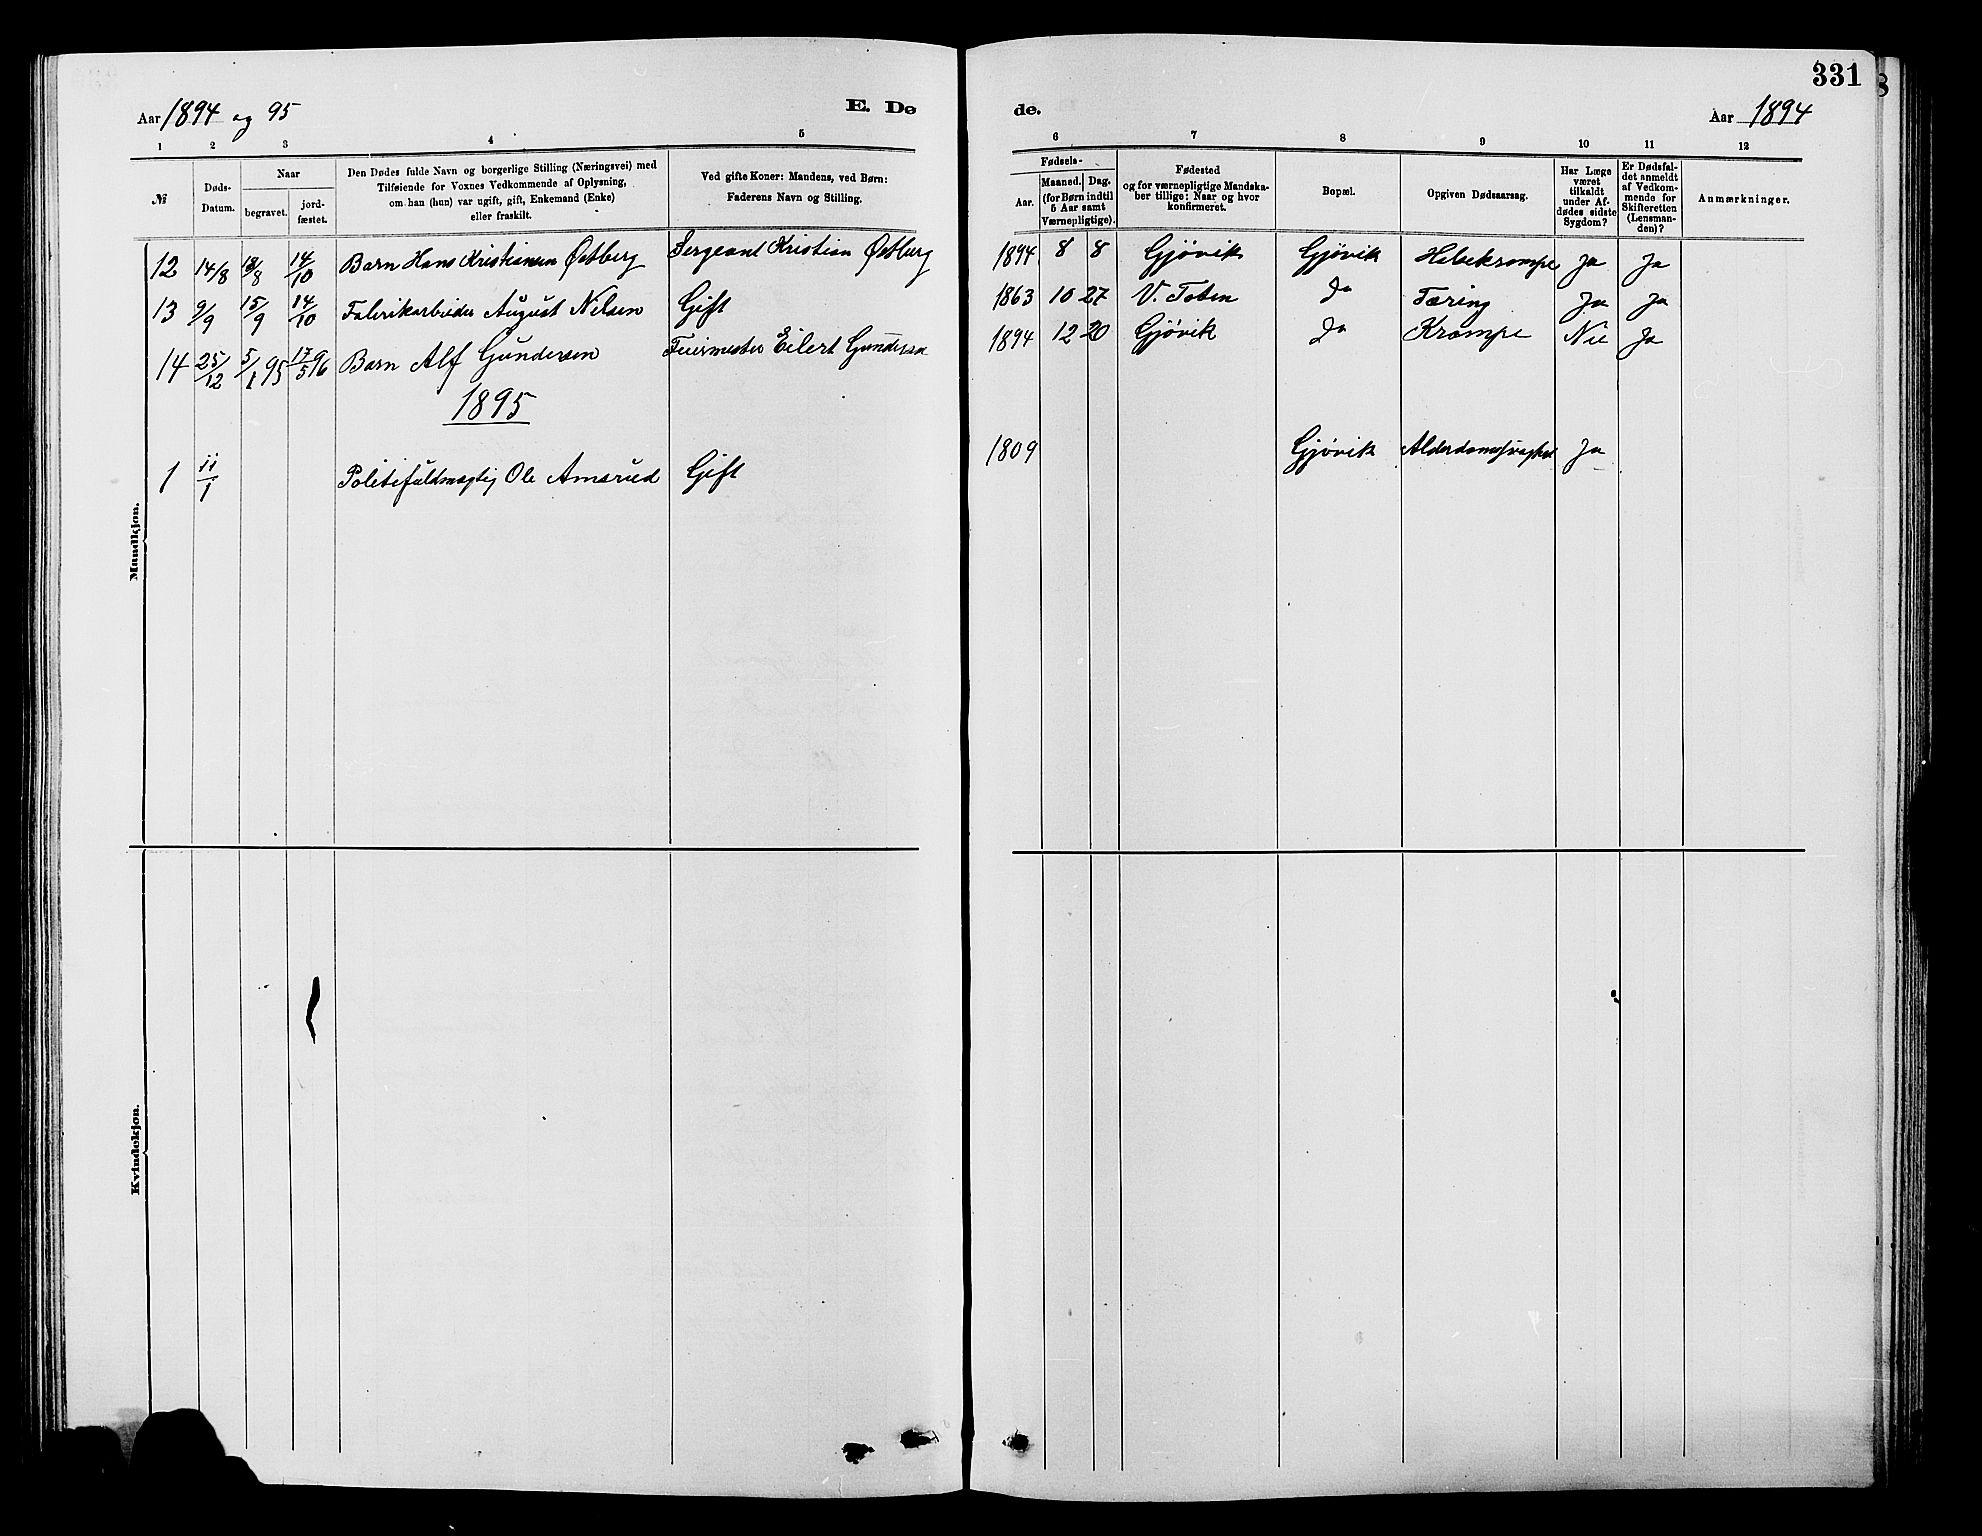 SAH, Vardal prestekontor, H/Ha/Hab/L0007: Klokkerbok nr. 7 /2, 1881-1895, s. 331